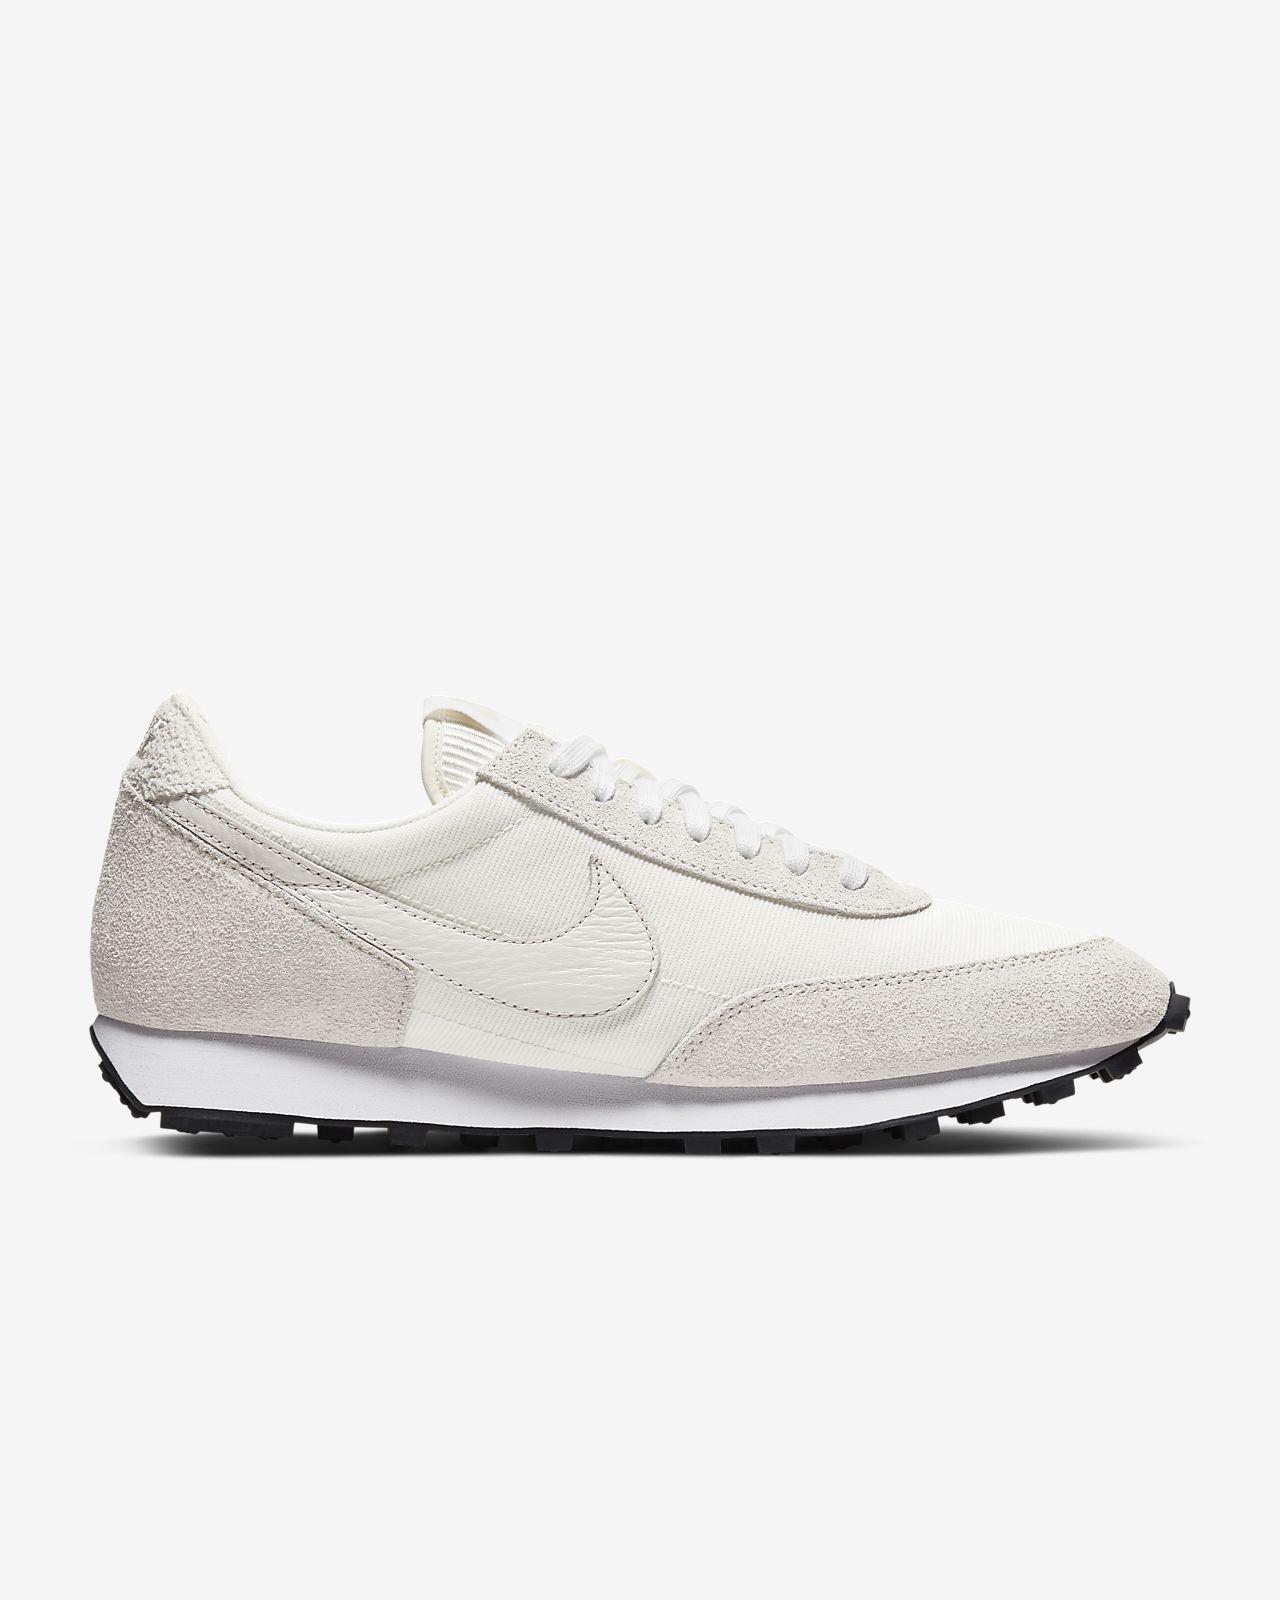 Nike Daybreak SailPhantom White CT3441 100